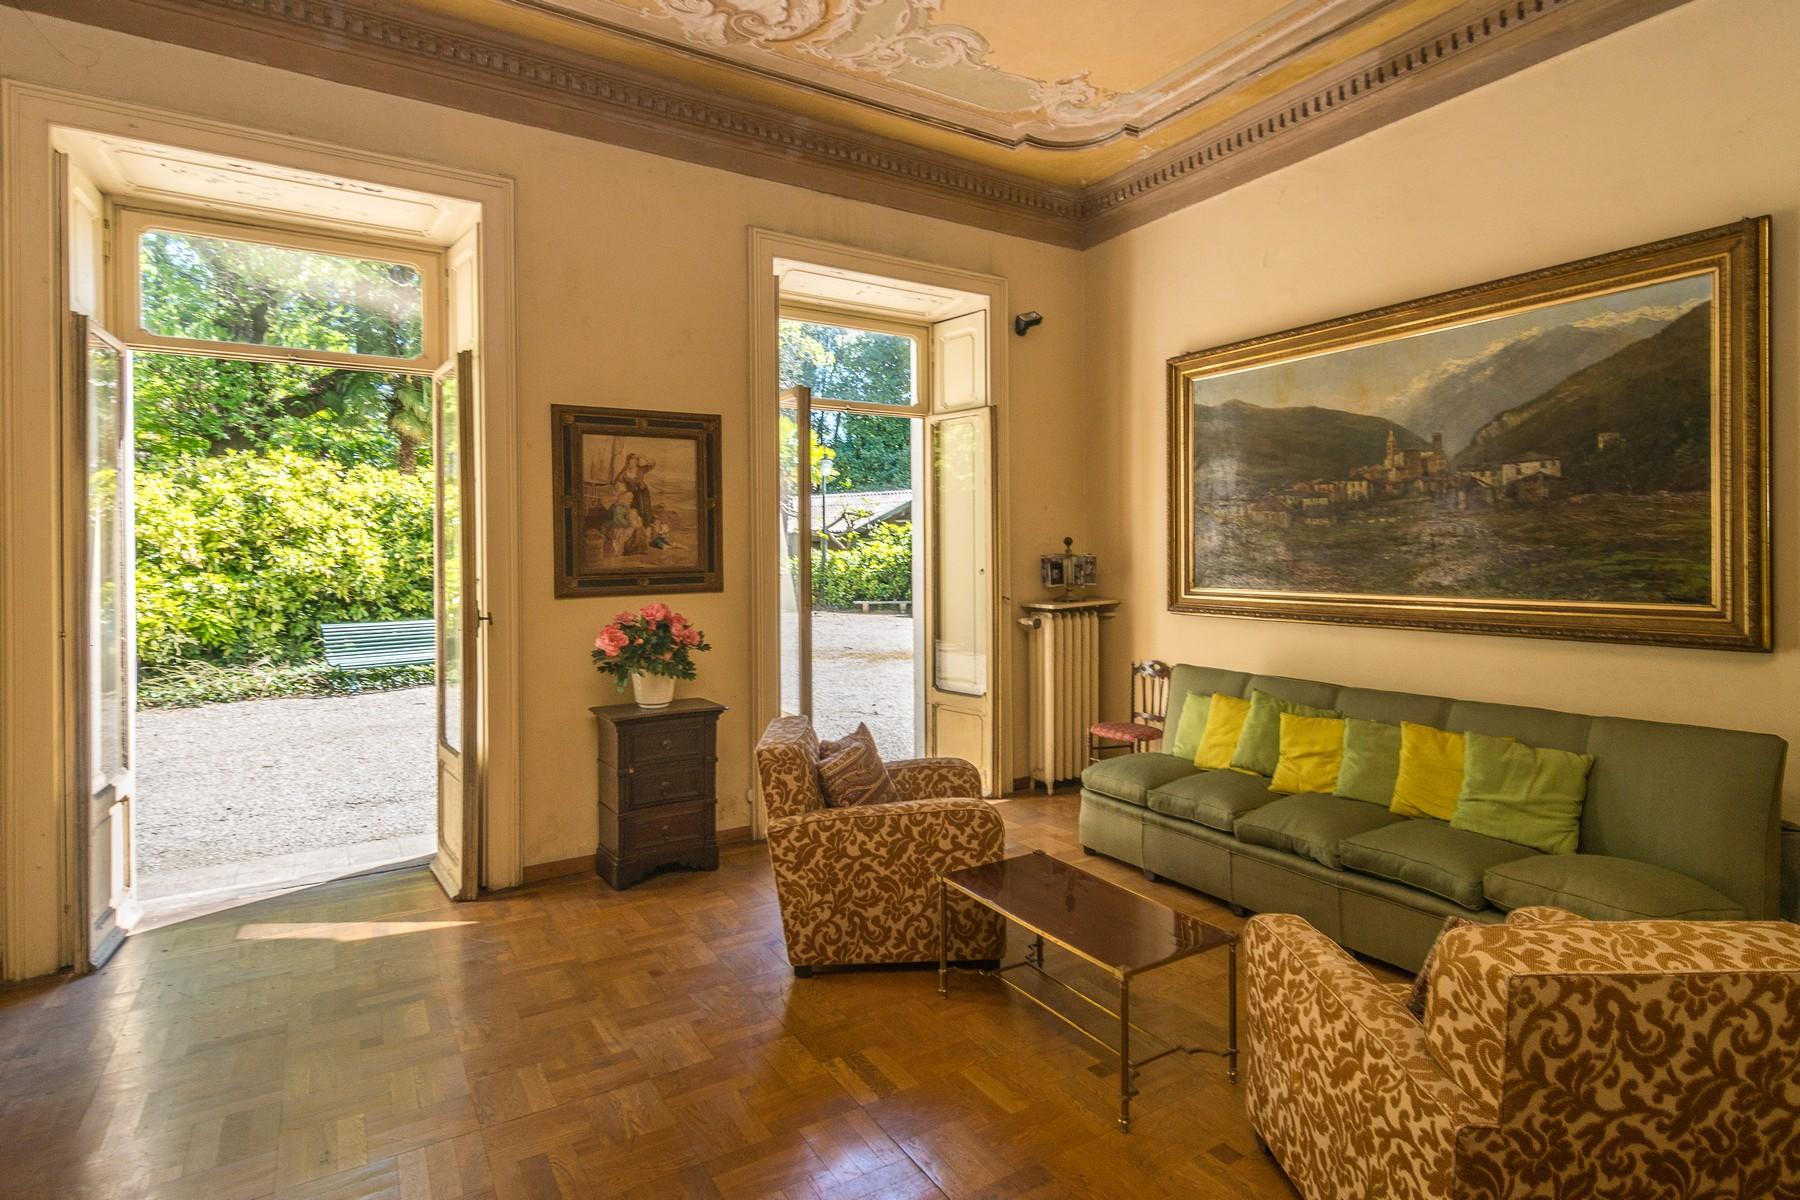 Villa in Vendita a Varese: 5 locali, 1500 mq - Foto 16